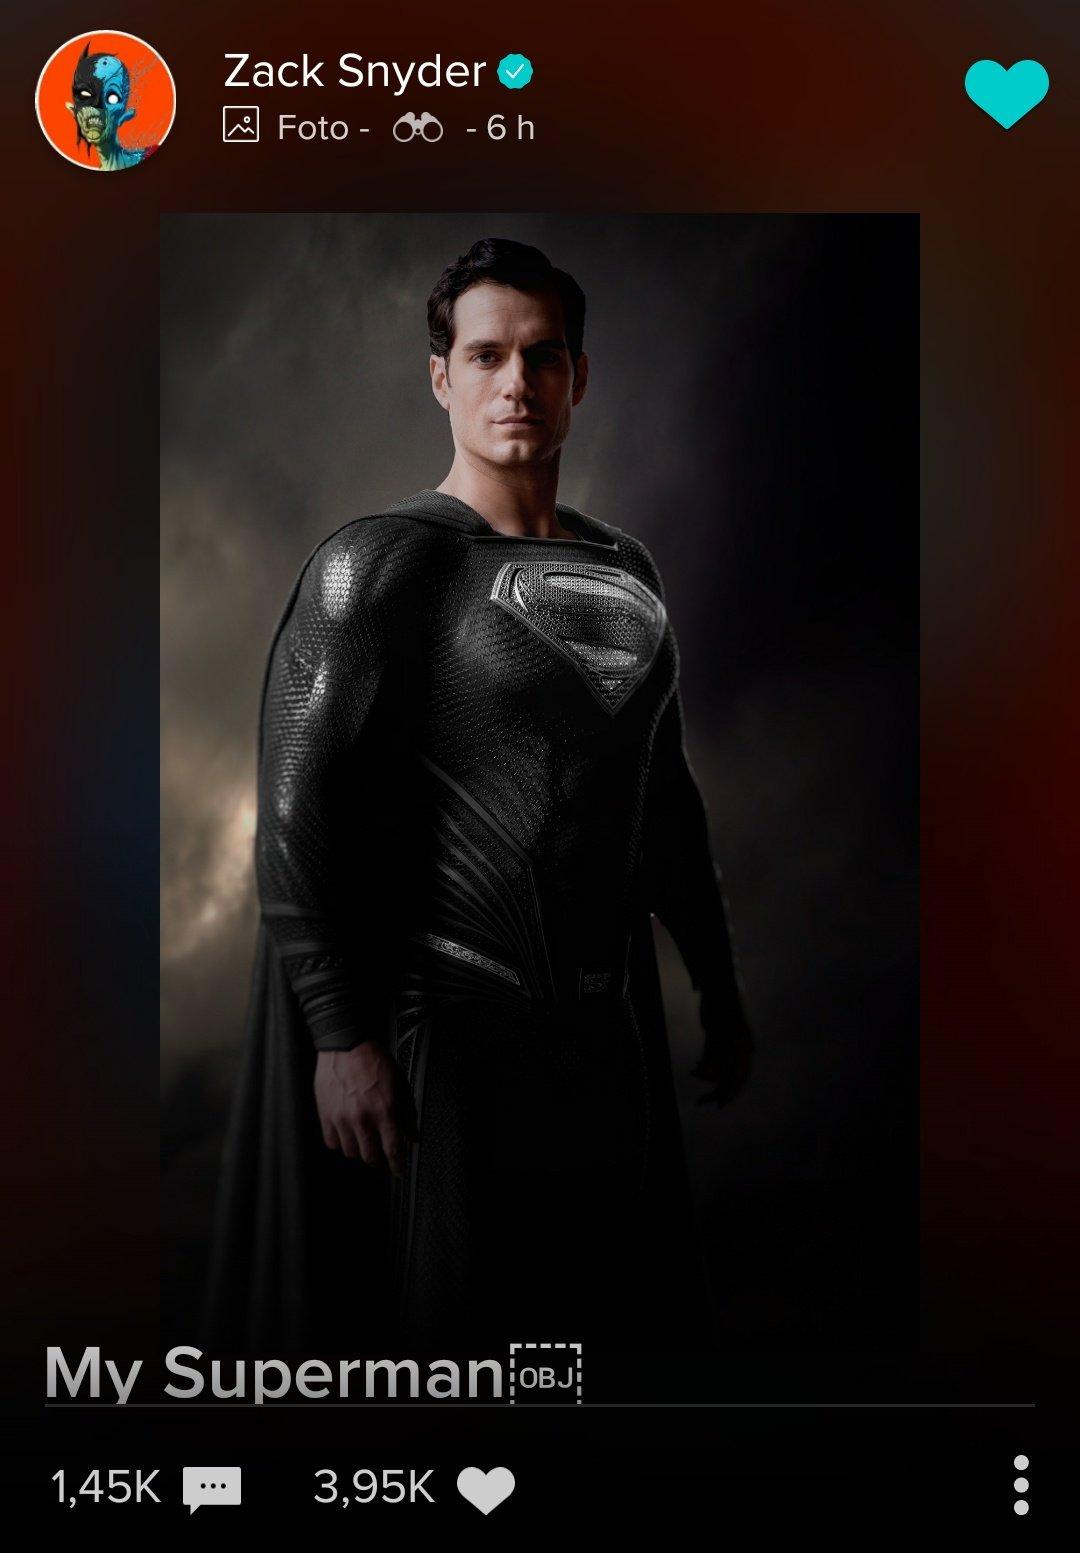 superman traje negro zack snyder